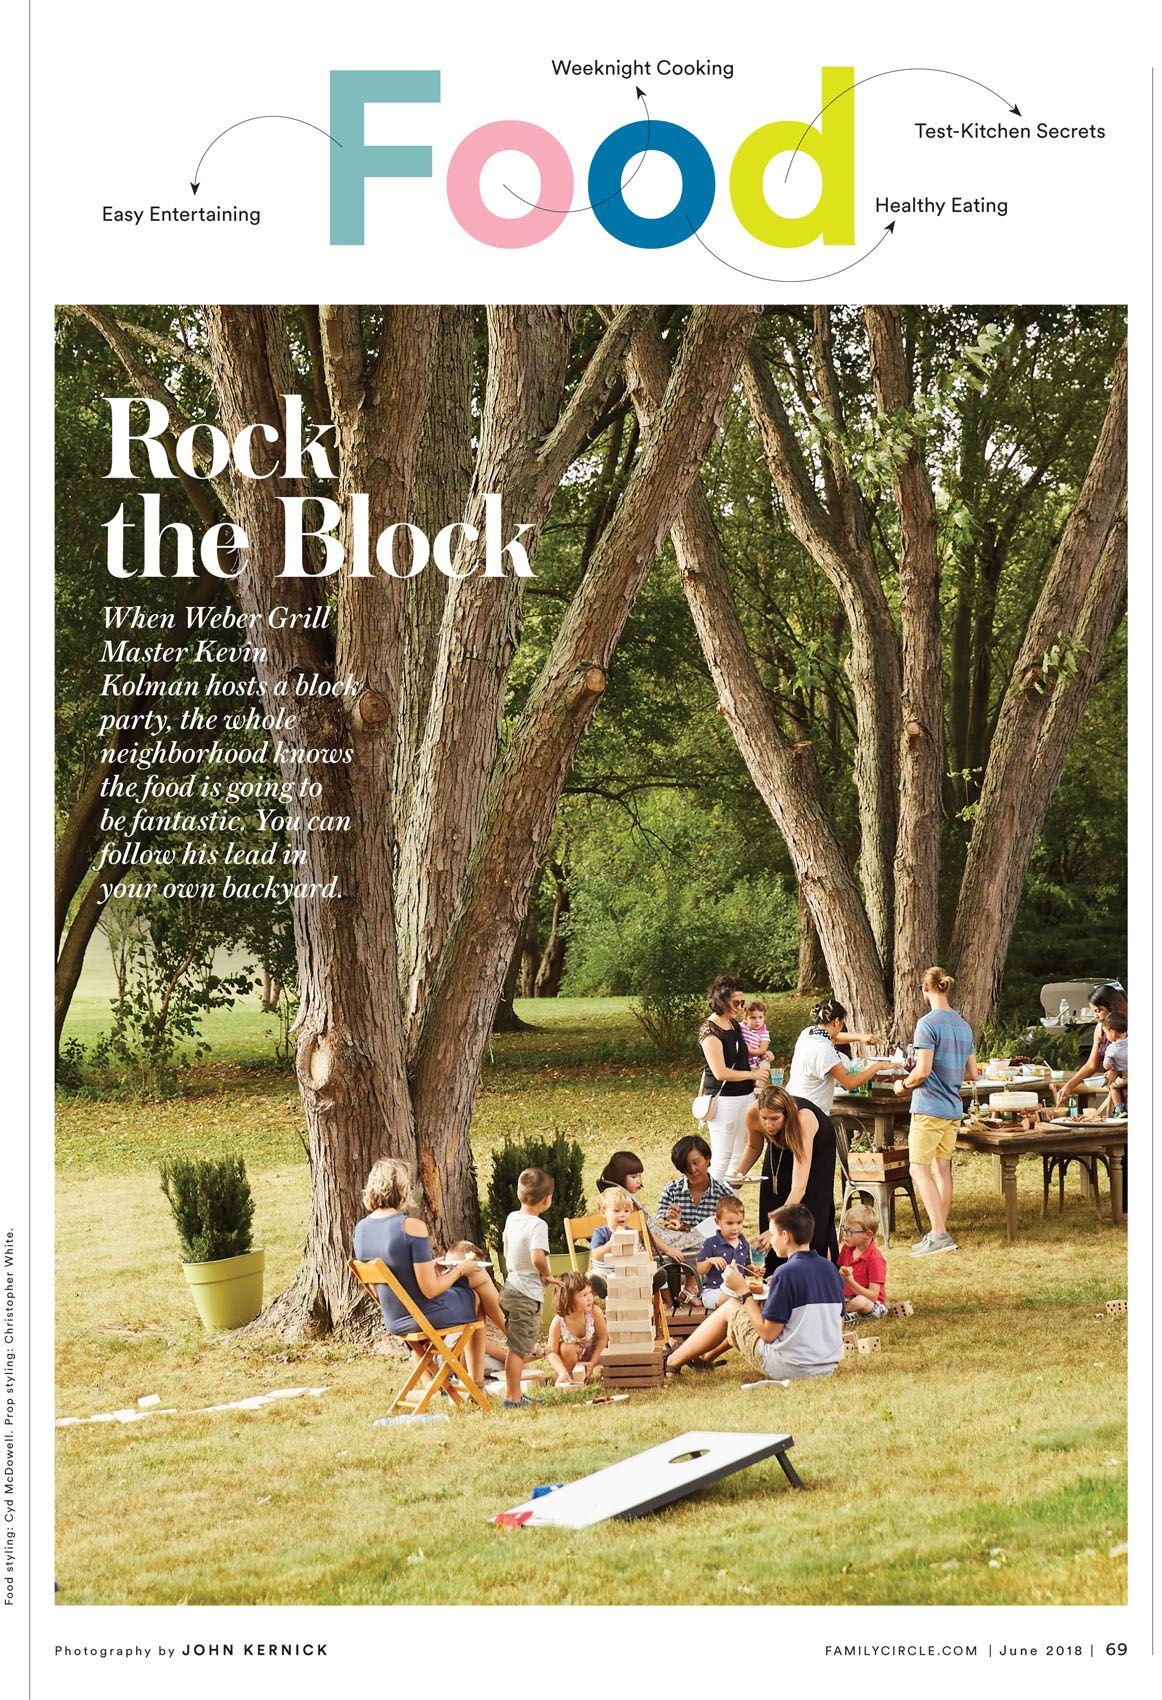 ChristopherWhite_FamilyCircle_June2018_ Block Party-1.jpg